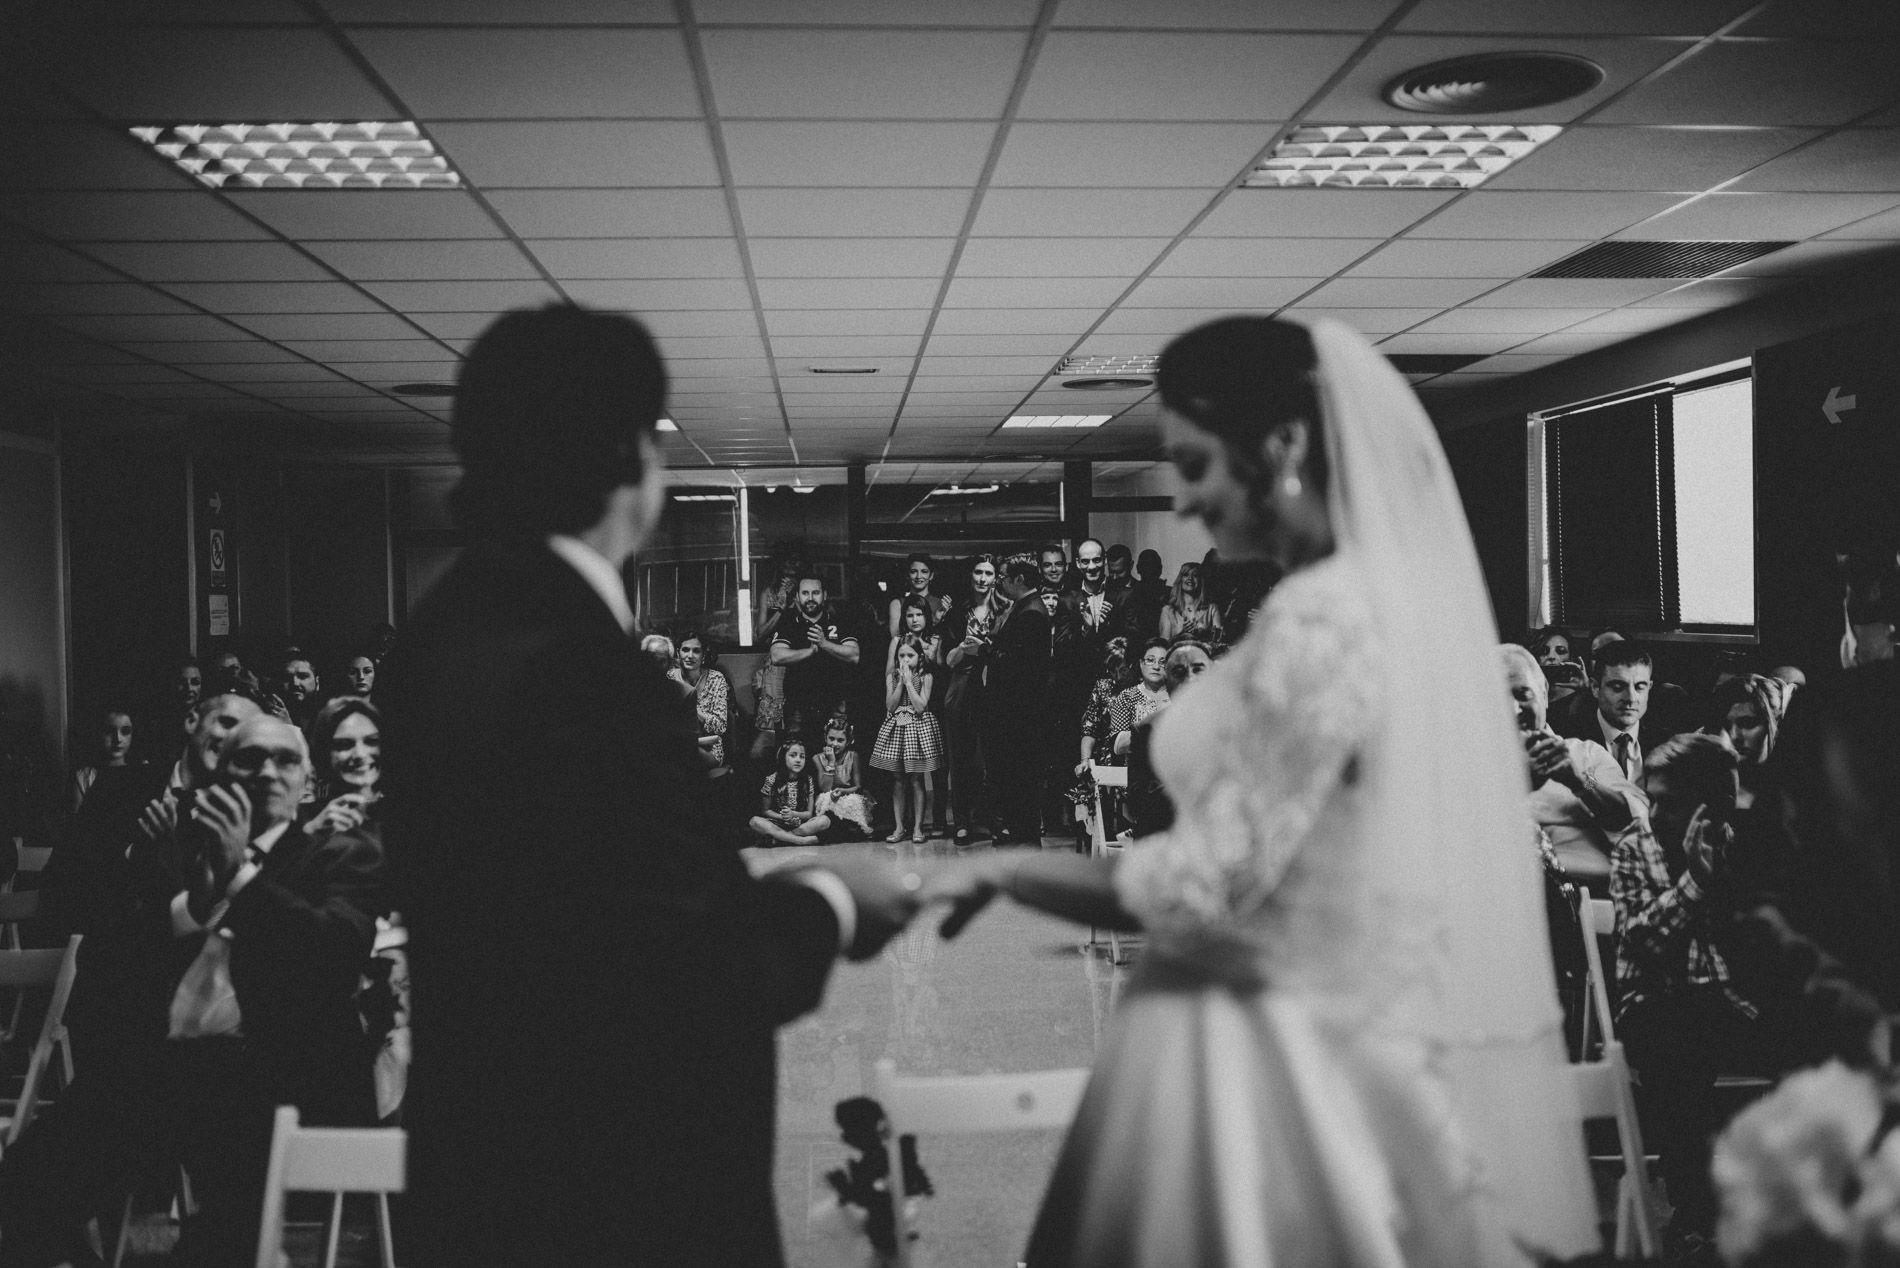 fotografia-boda-santi-miquel-bj-030